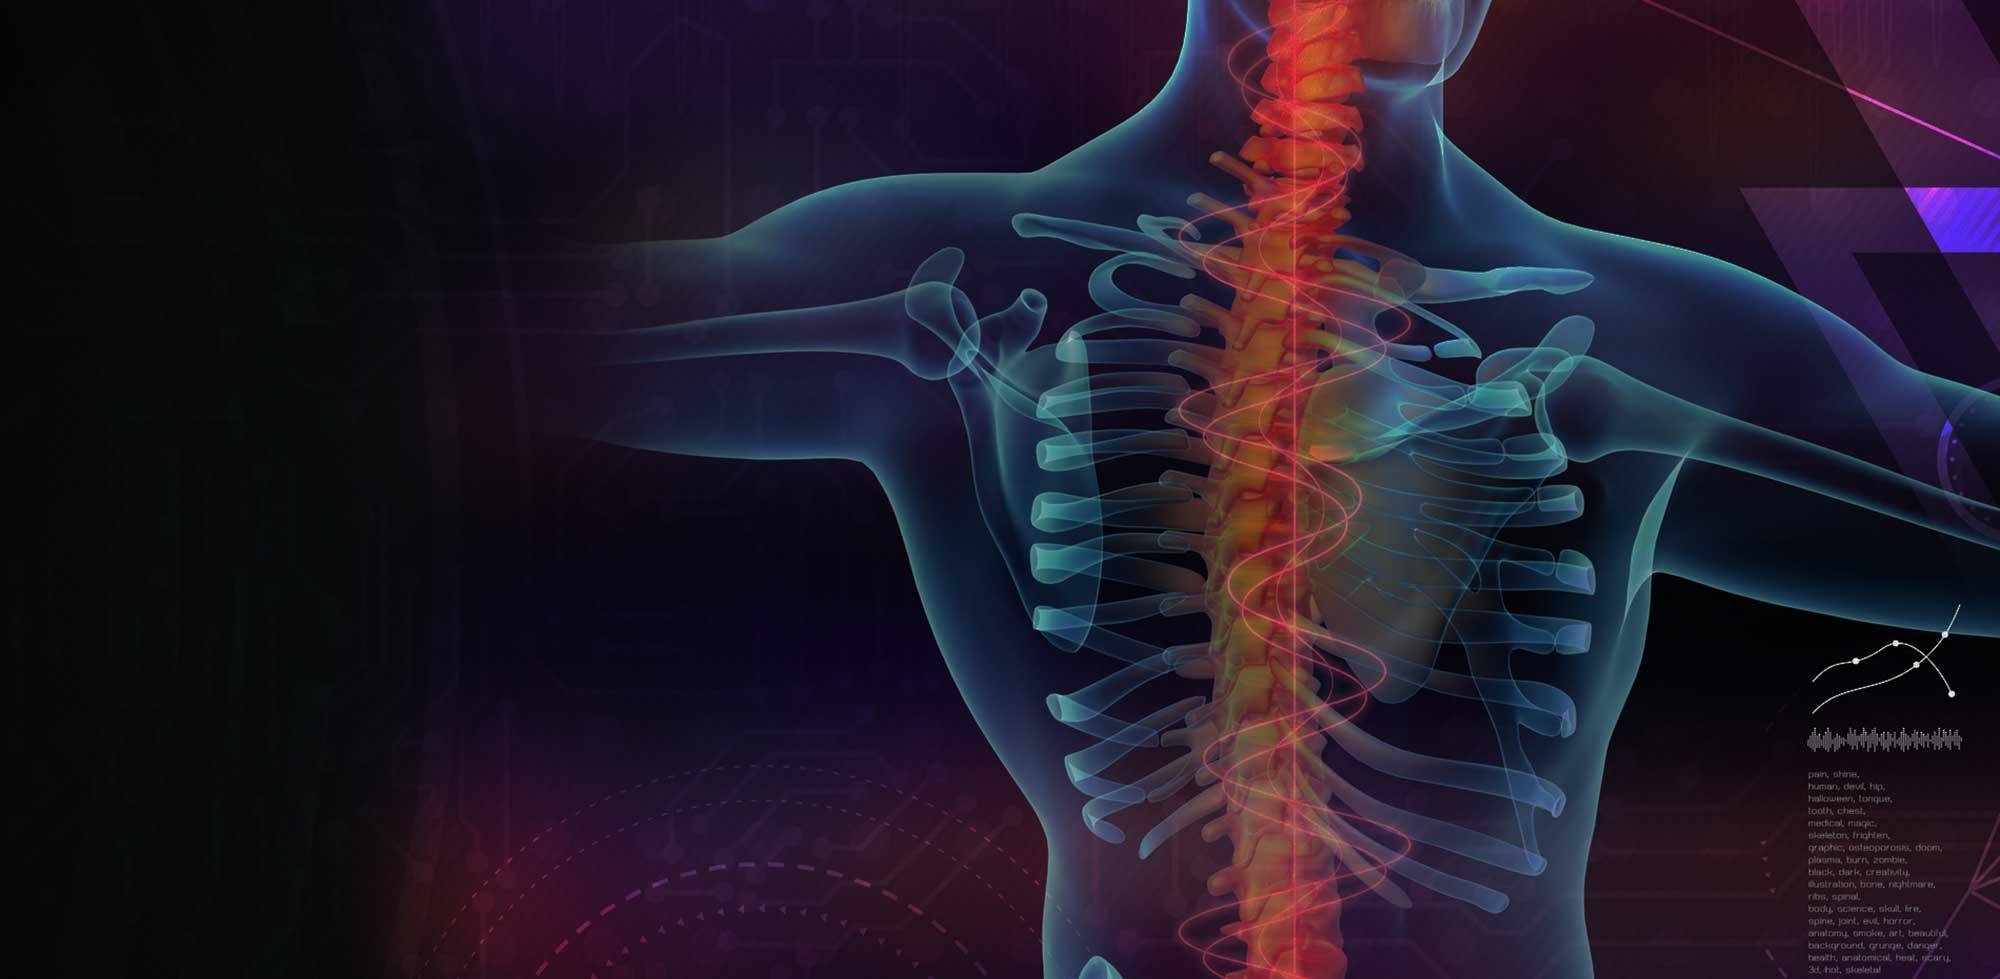 Lewis Frazier, Jr, MD - Tarpon Orthopedics - Pain Management - Plano, TX